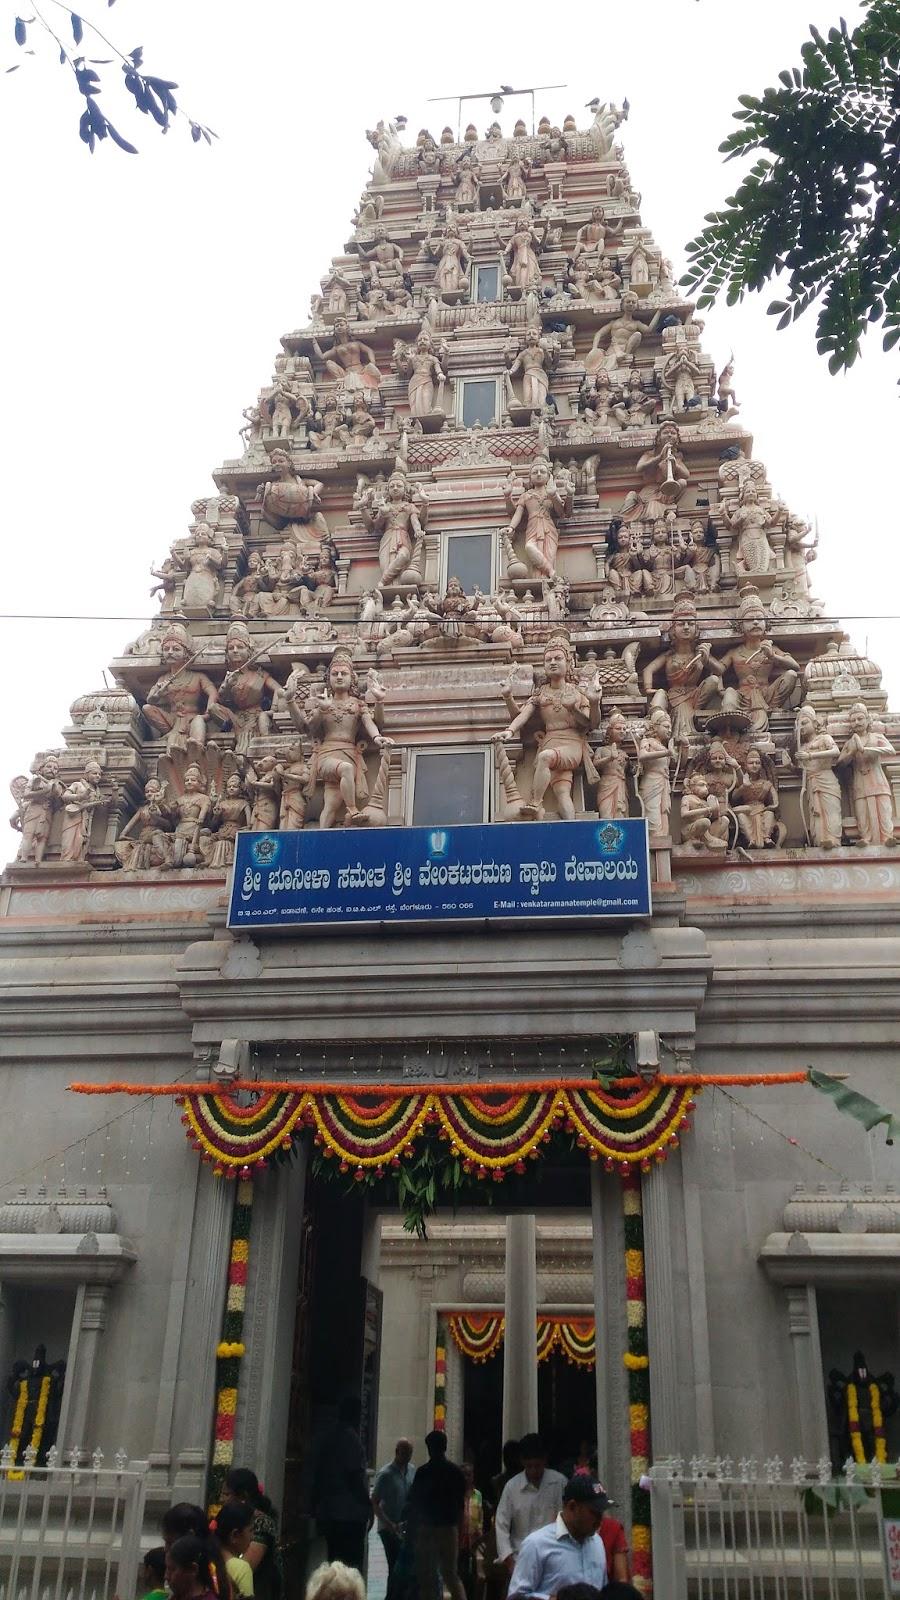 devagiri sri venkateswara temple in bangalore dating